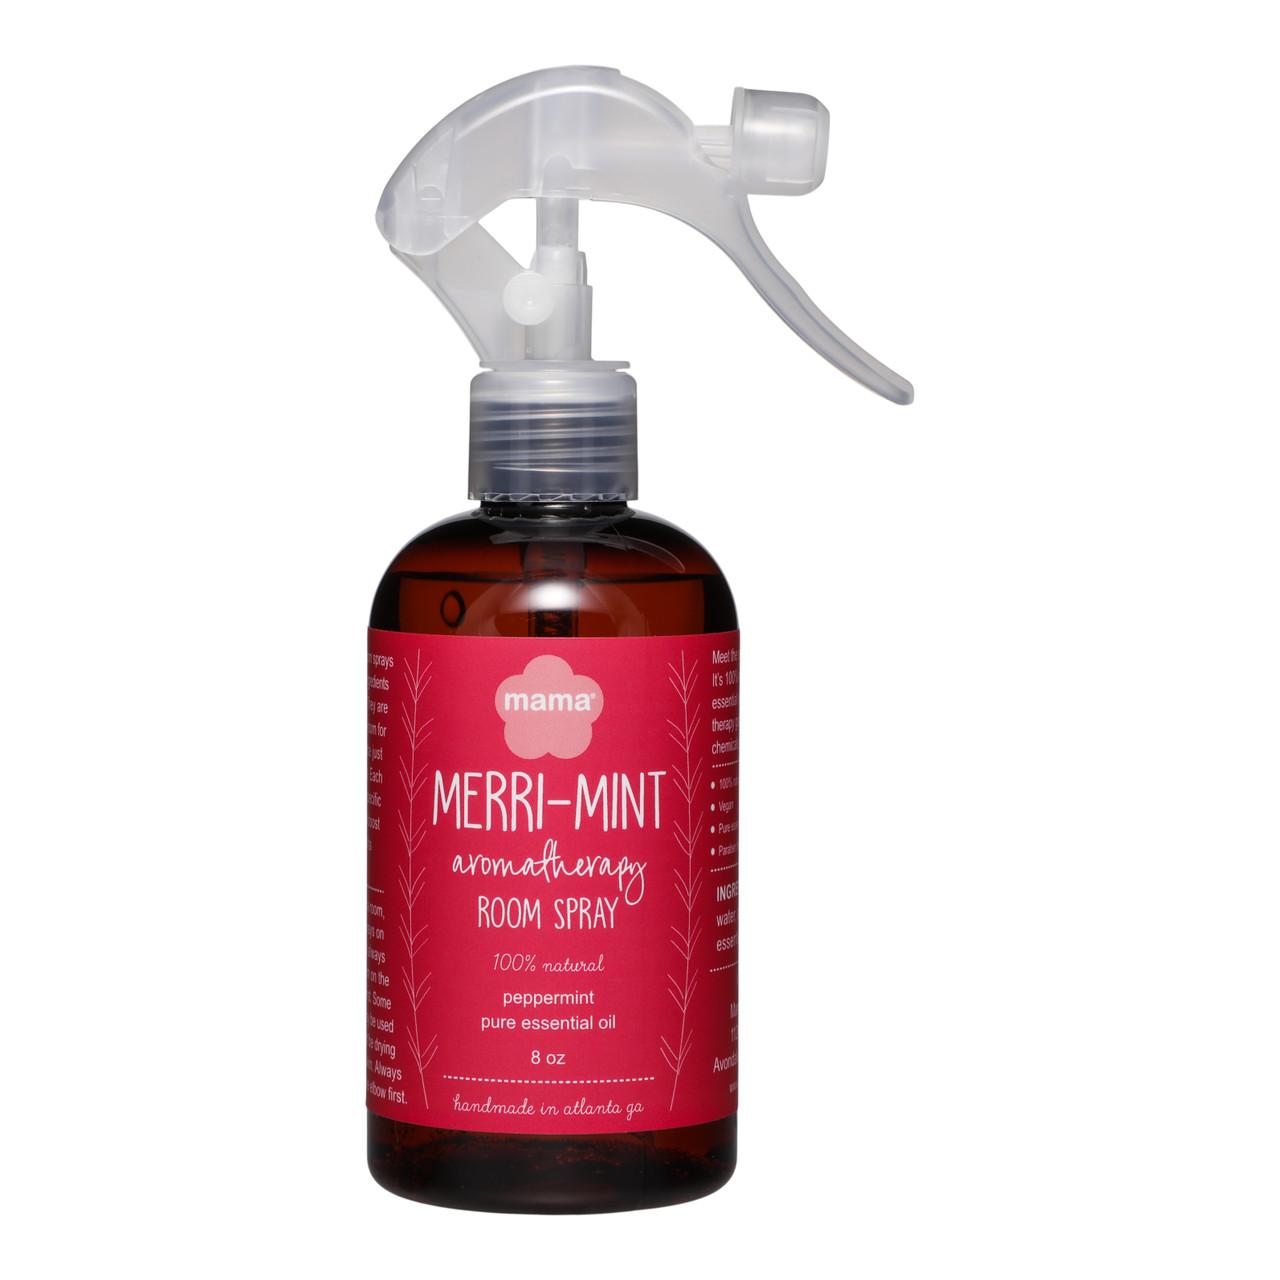 Merri-Mint Room Spray   Mama Bath + Body